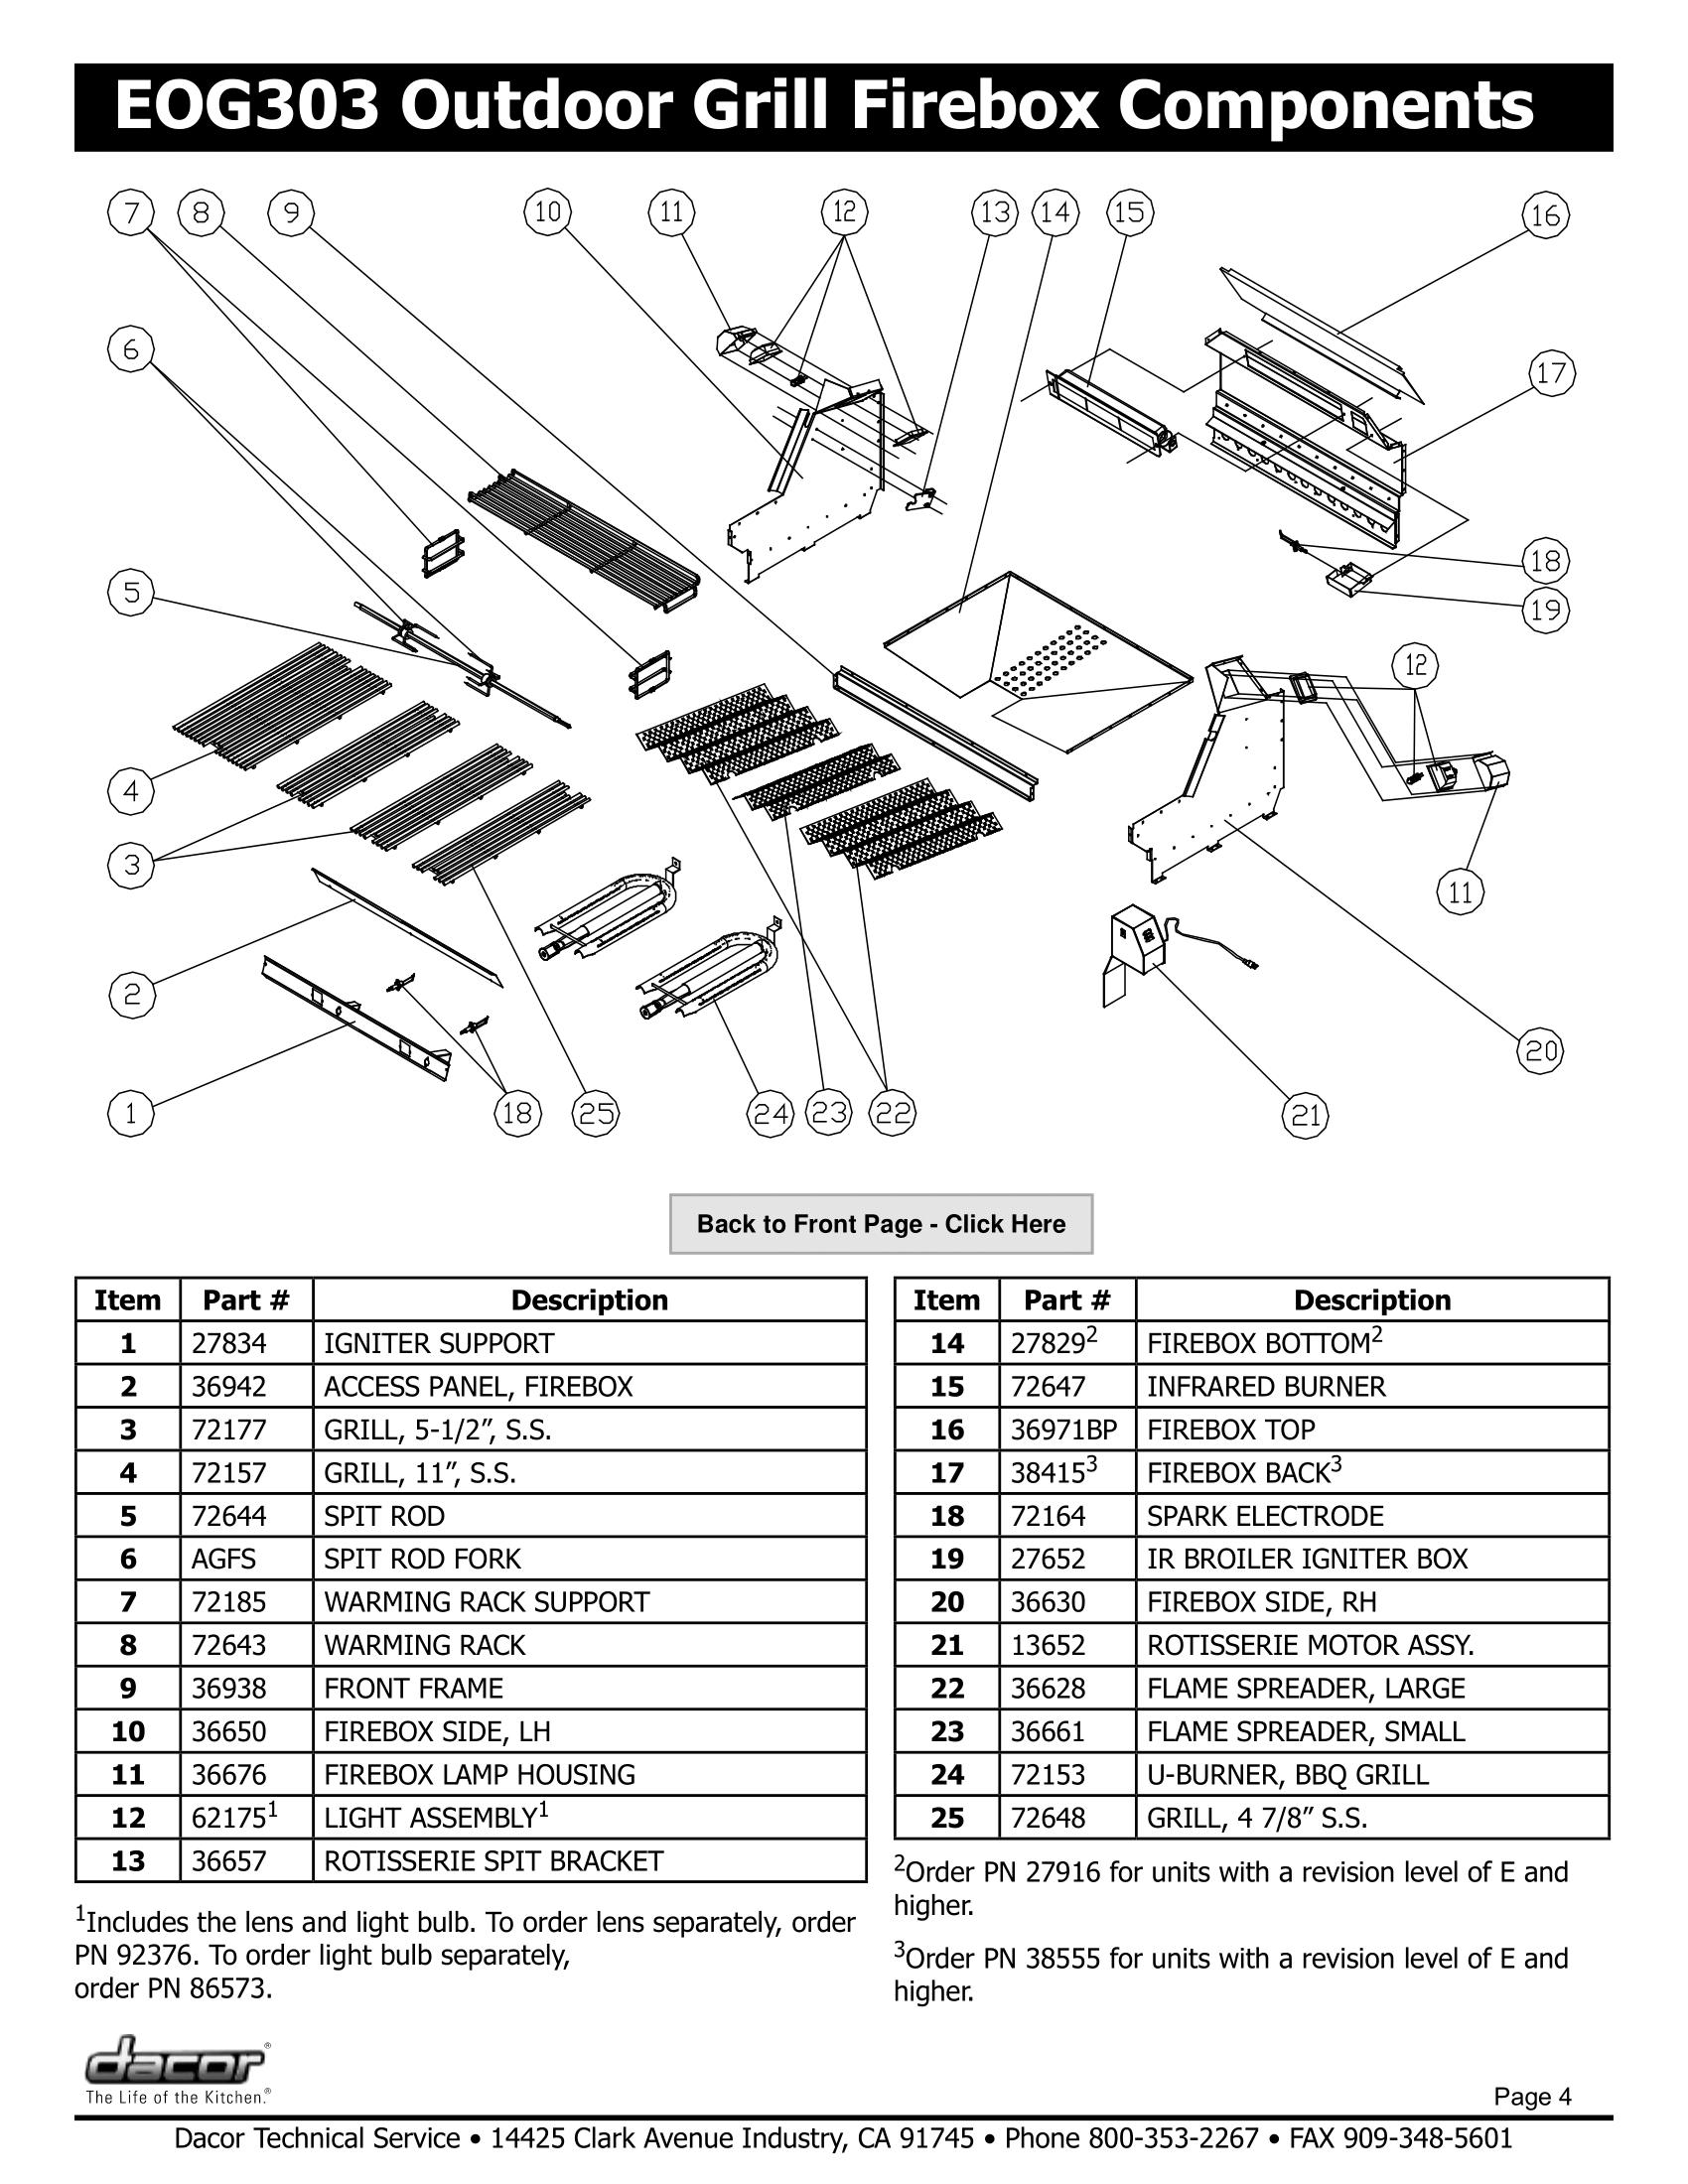 Dacor EOG303 Firebox Components Schematic